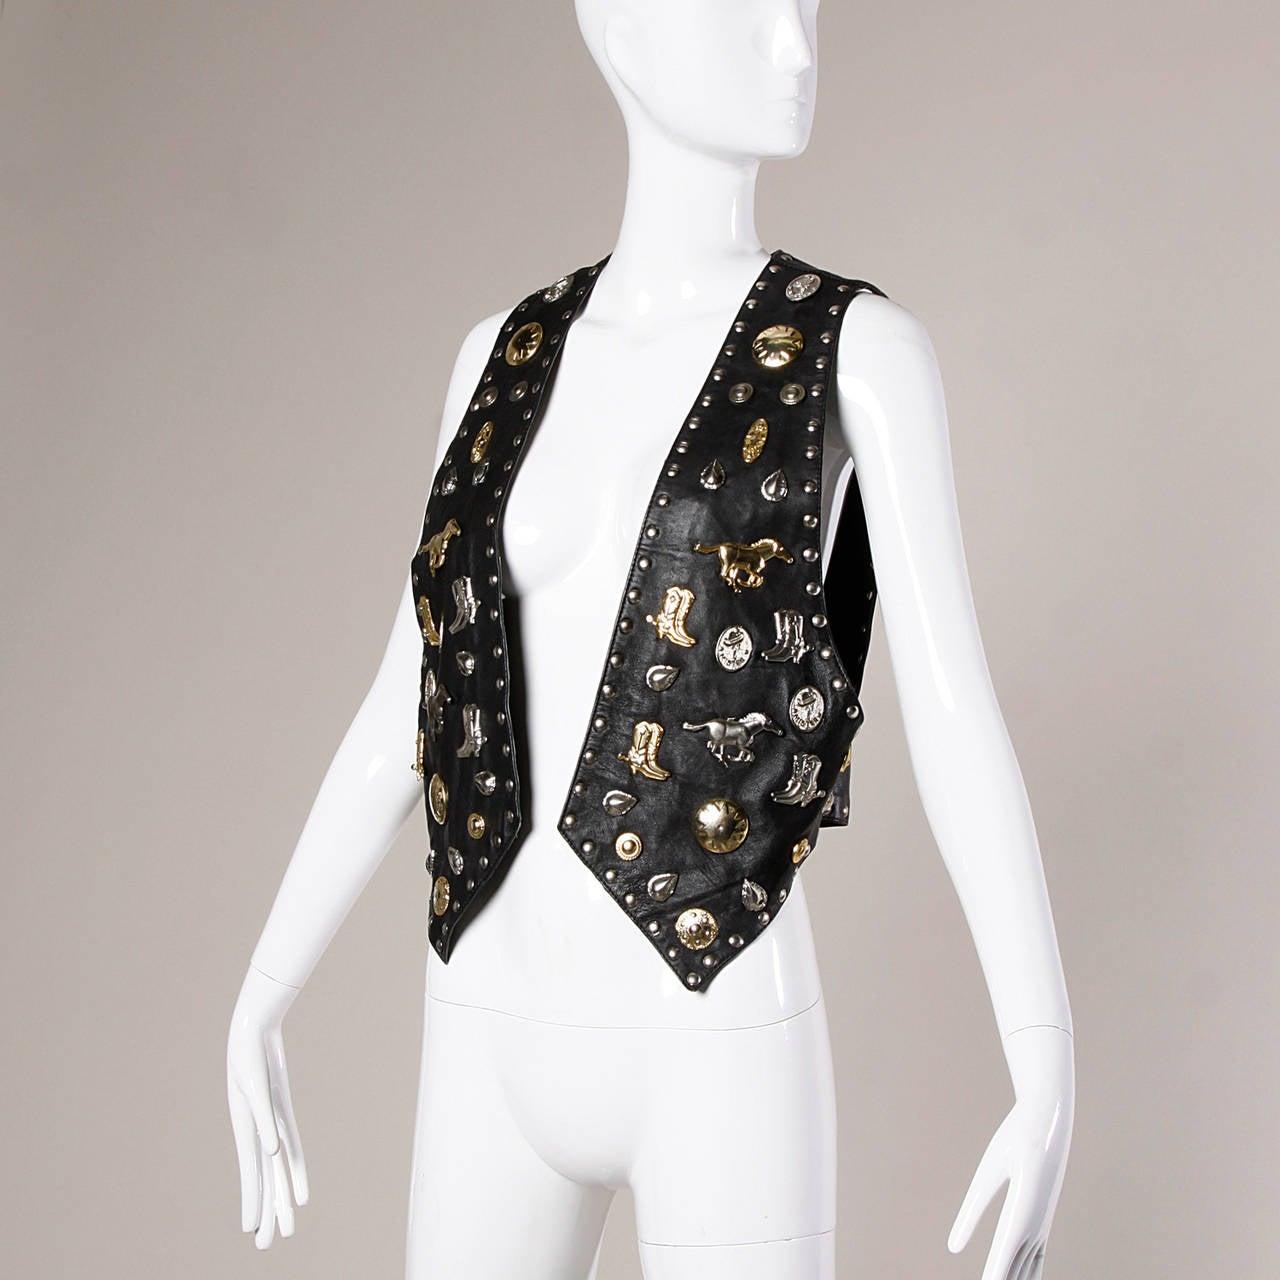 Vintage Leather Vest with Concho, Cowboy Boots, + Horse Studs 5